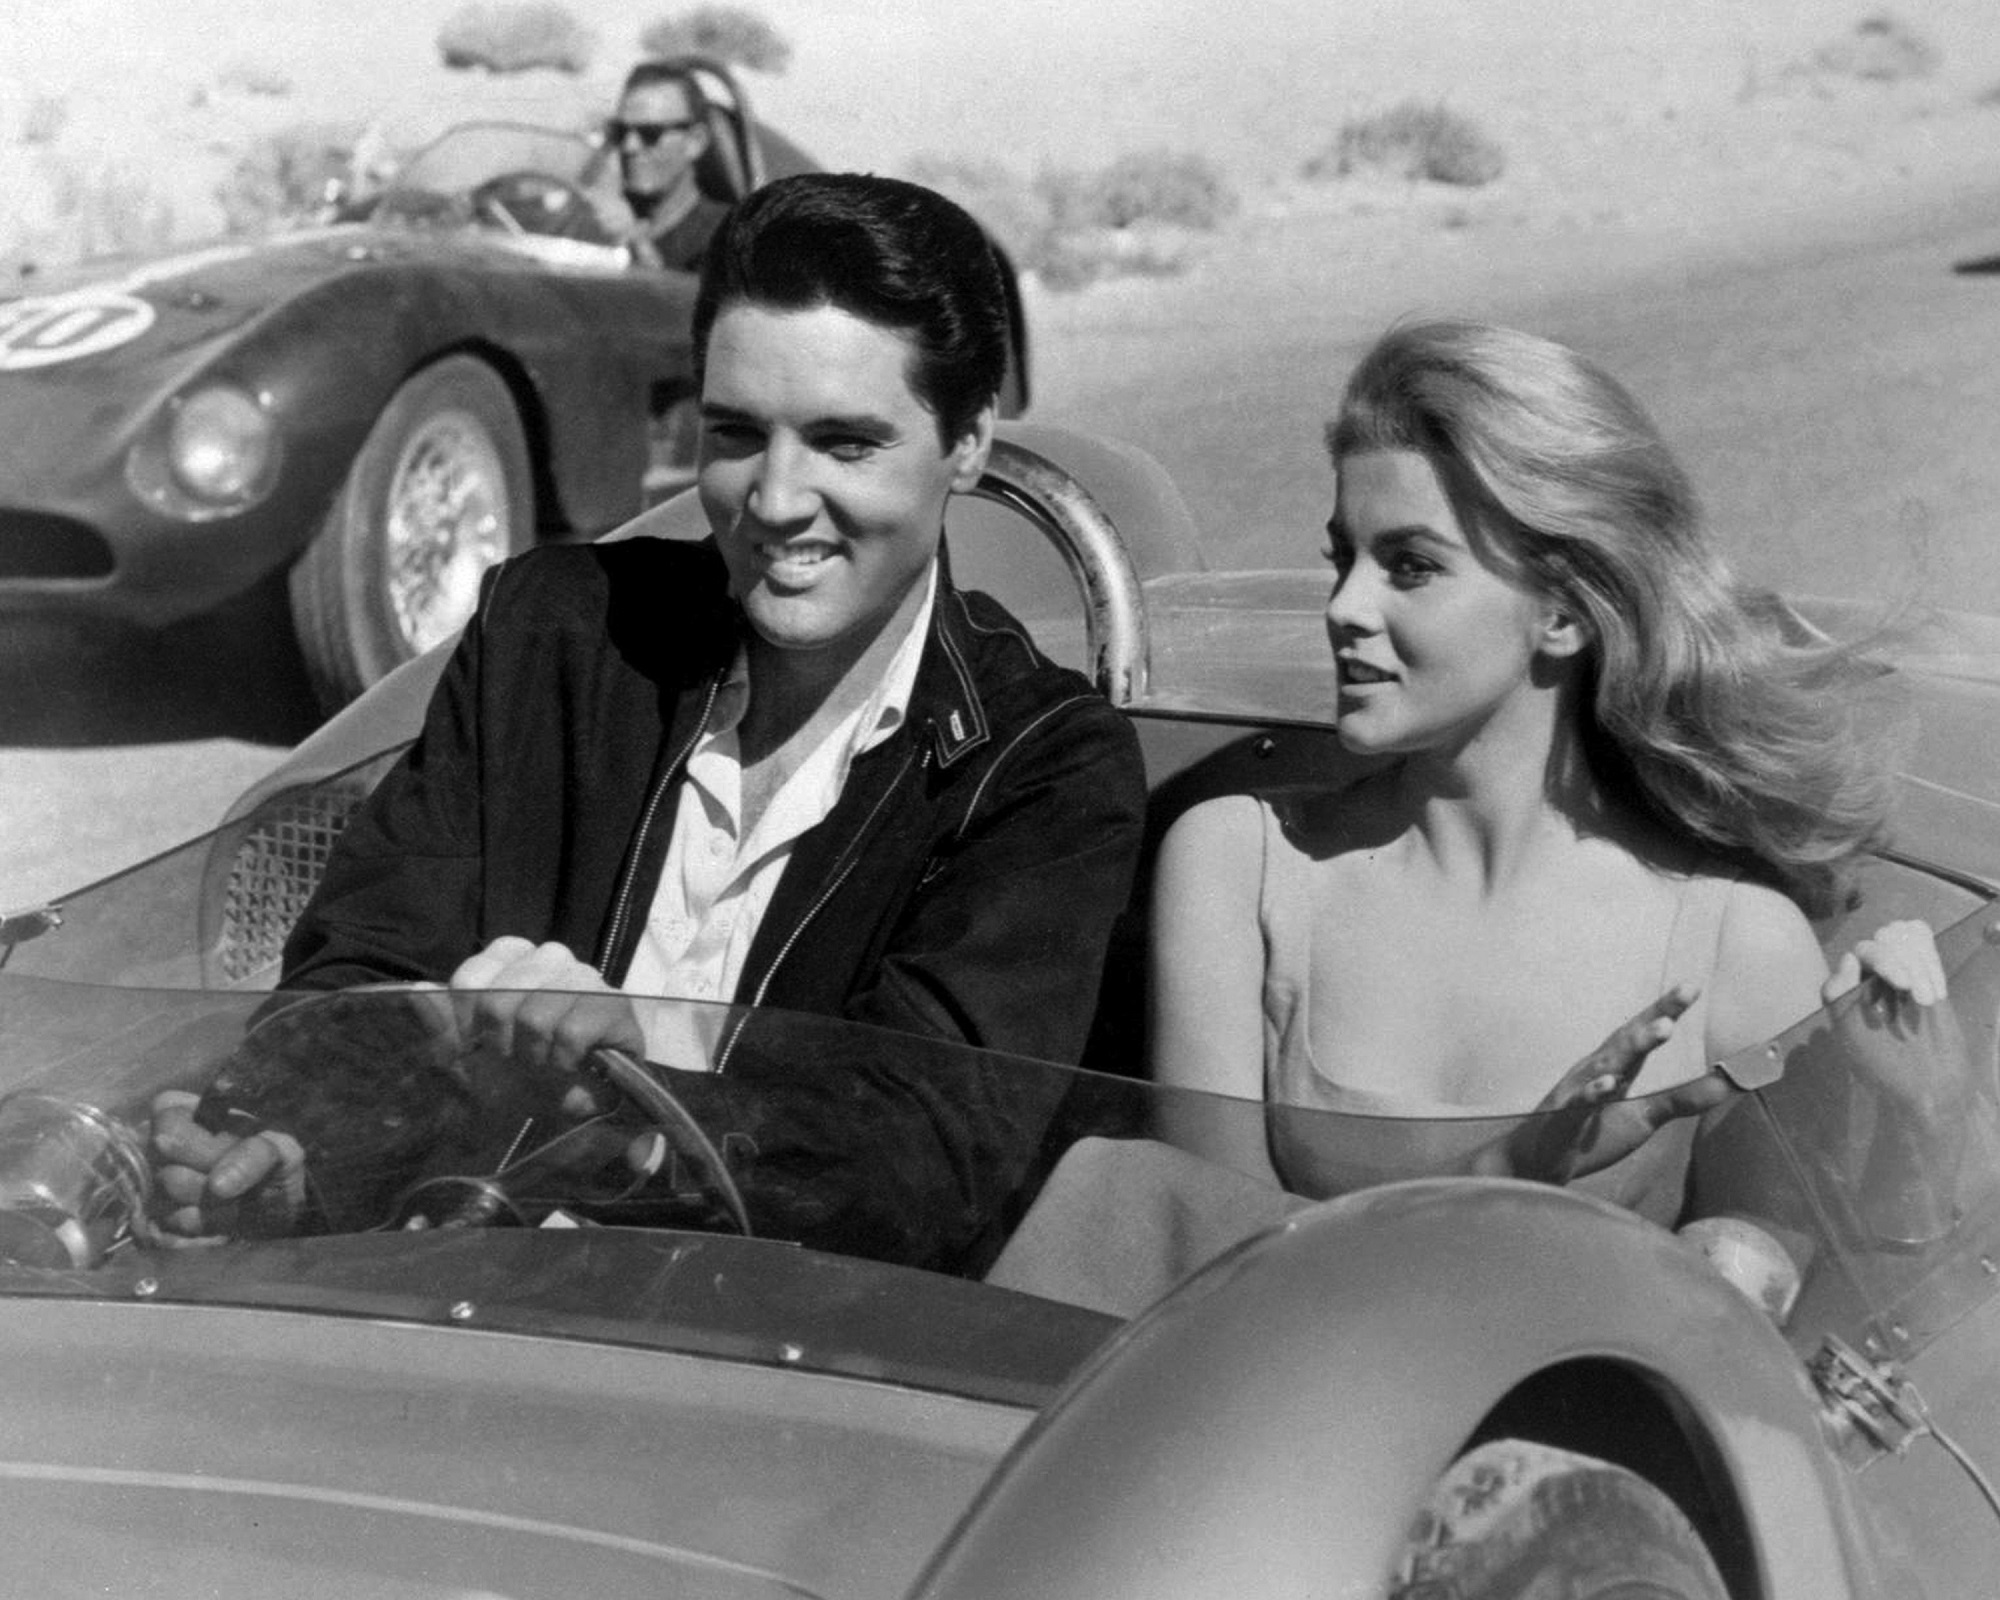 Ann-Margret and Elvis Presley in the movie Viva Las Vegas